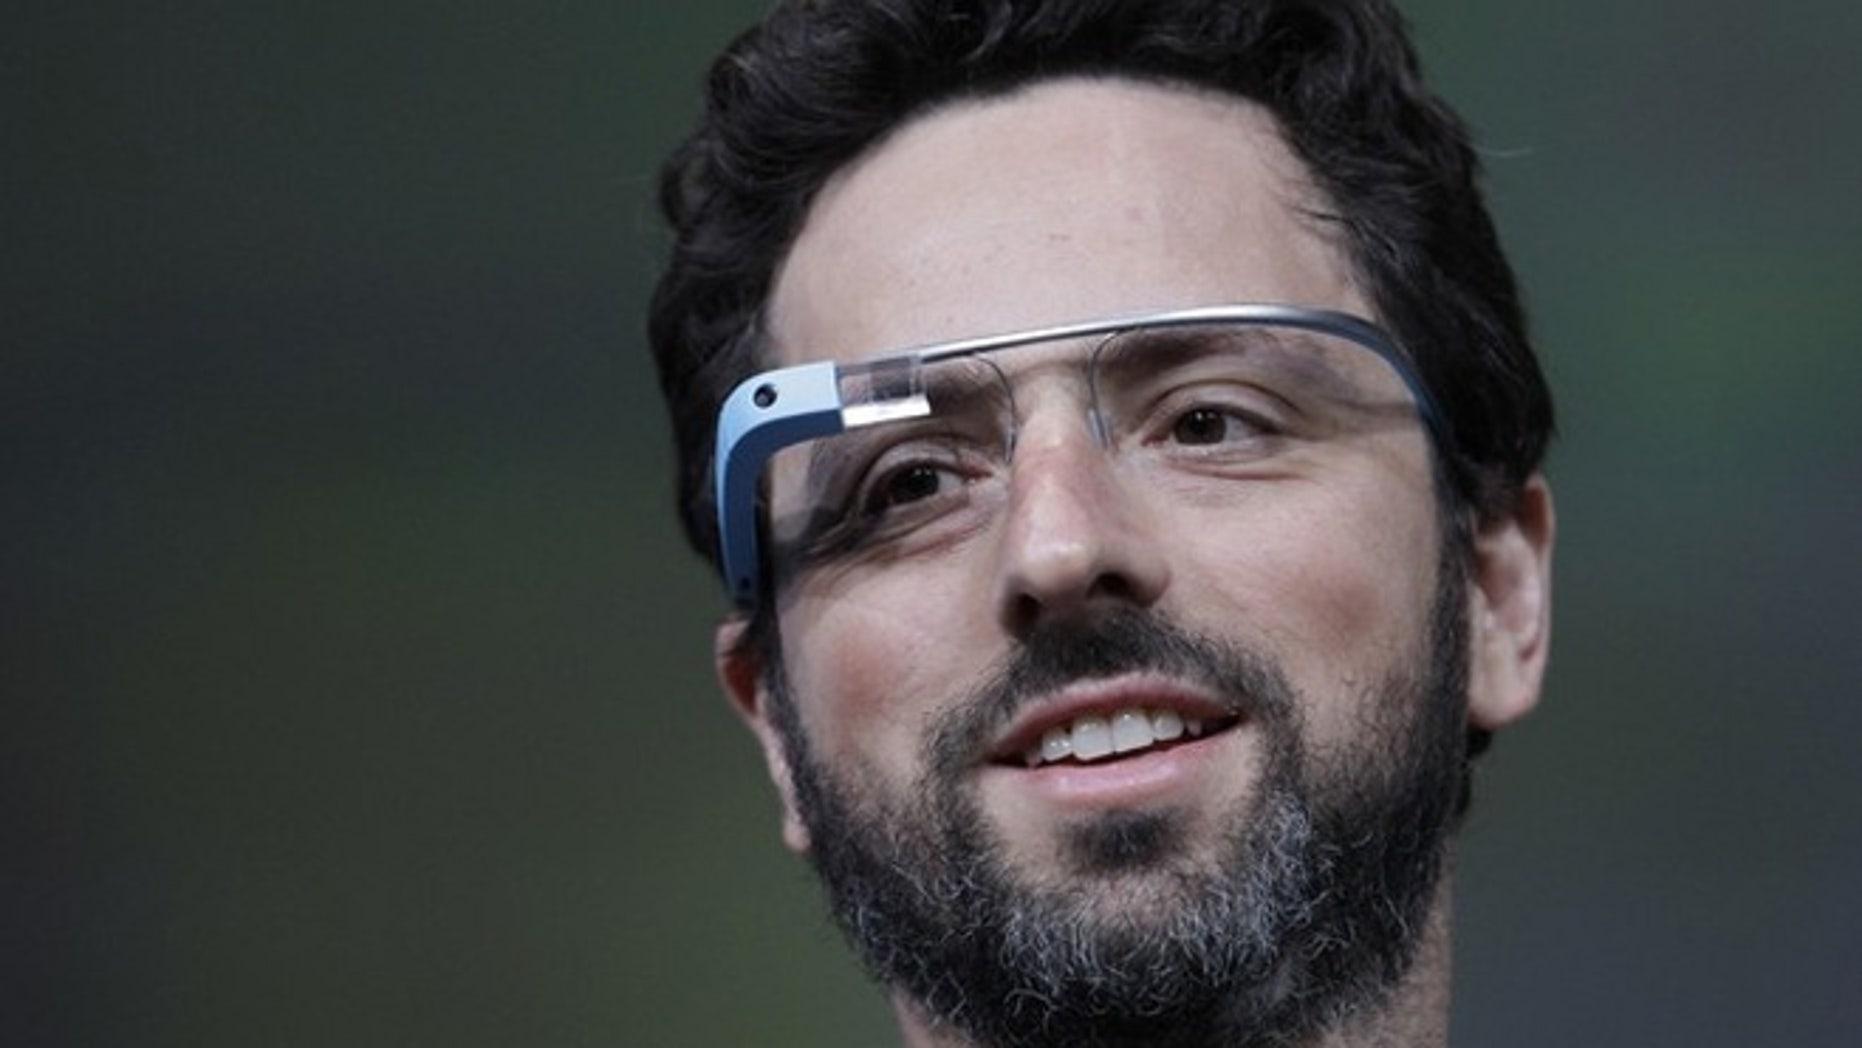 Google co-founder Sergei Brin shows off Google Glass.